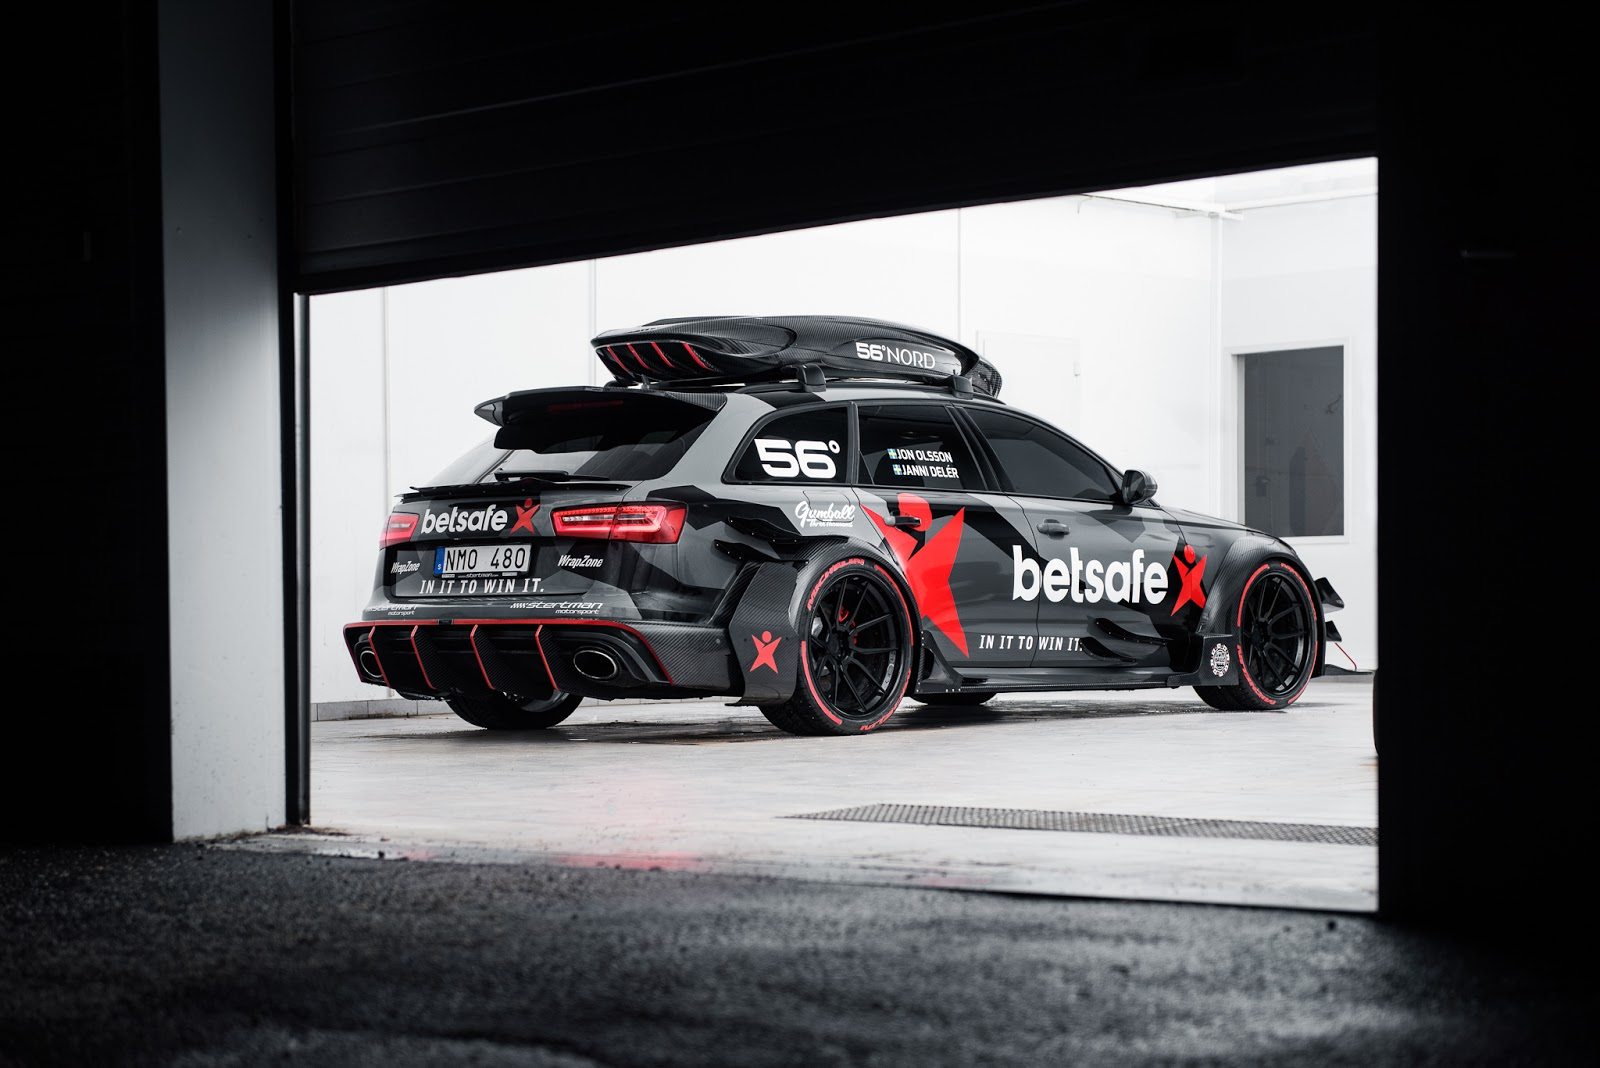 rs6 Τα 7 πιο extreme offroad οχήματα στον πλανήτη! Audi RS6, Fun, Kamaz 4326 Dakar, Offroad, PEUGEOT 208 WRX, Red Bull, videos, zblog